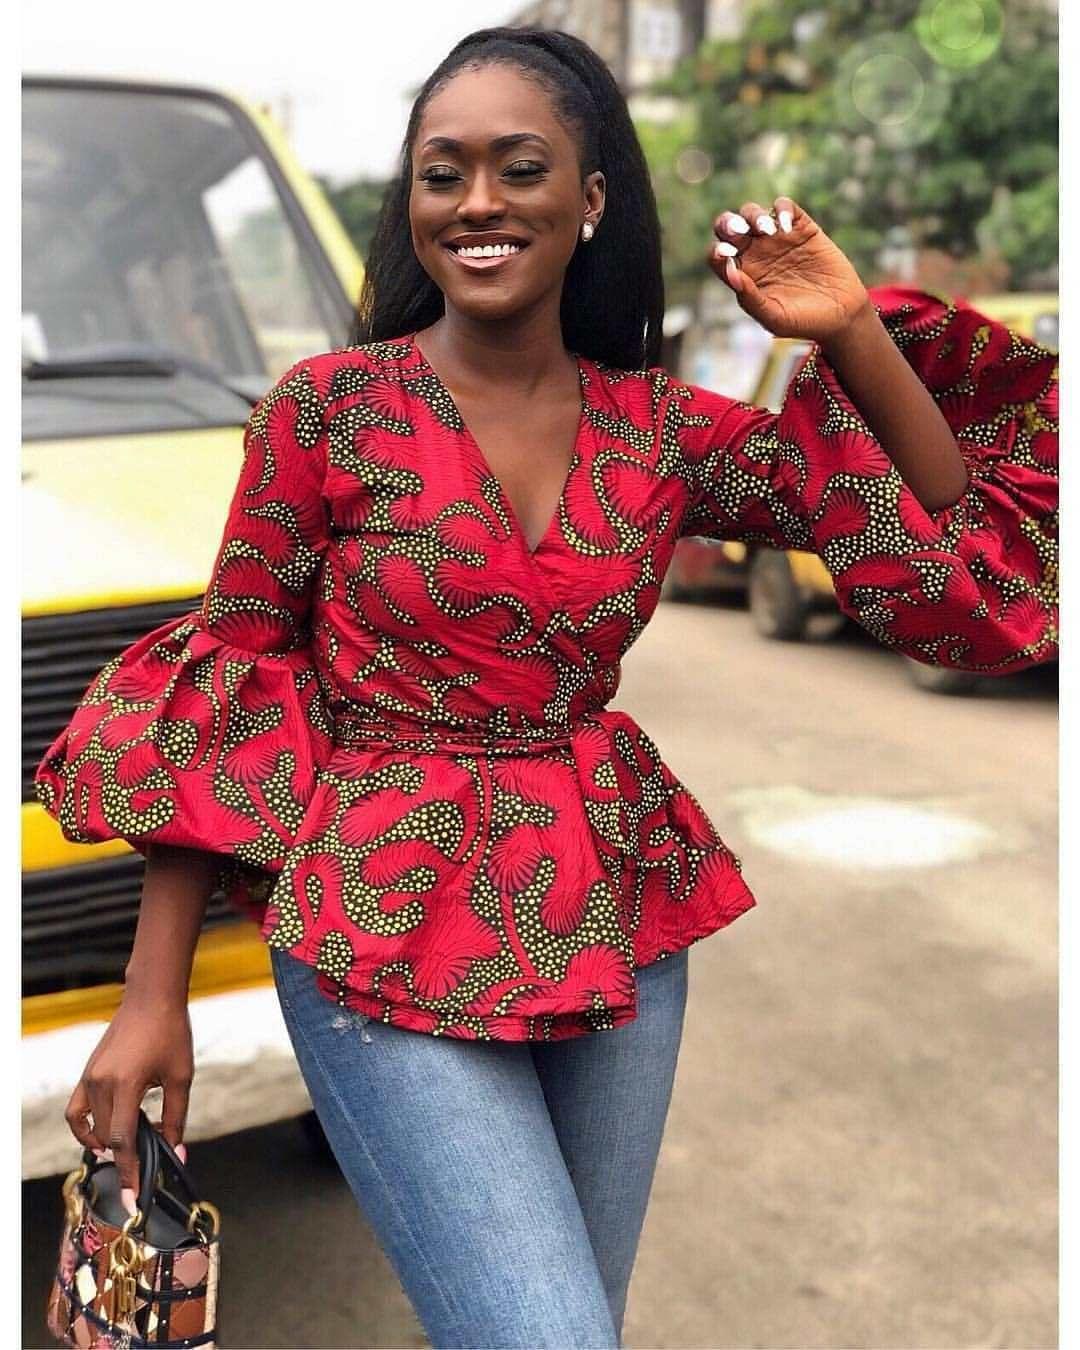 ankara styles - - PICK YOUR FAVOURITE ANKARA STYLES AND SHOW IT TO YOUR TAILOR - photo #afrikanischekleidung